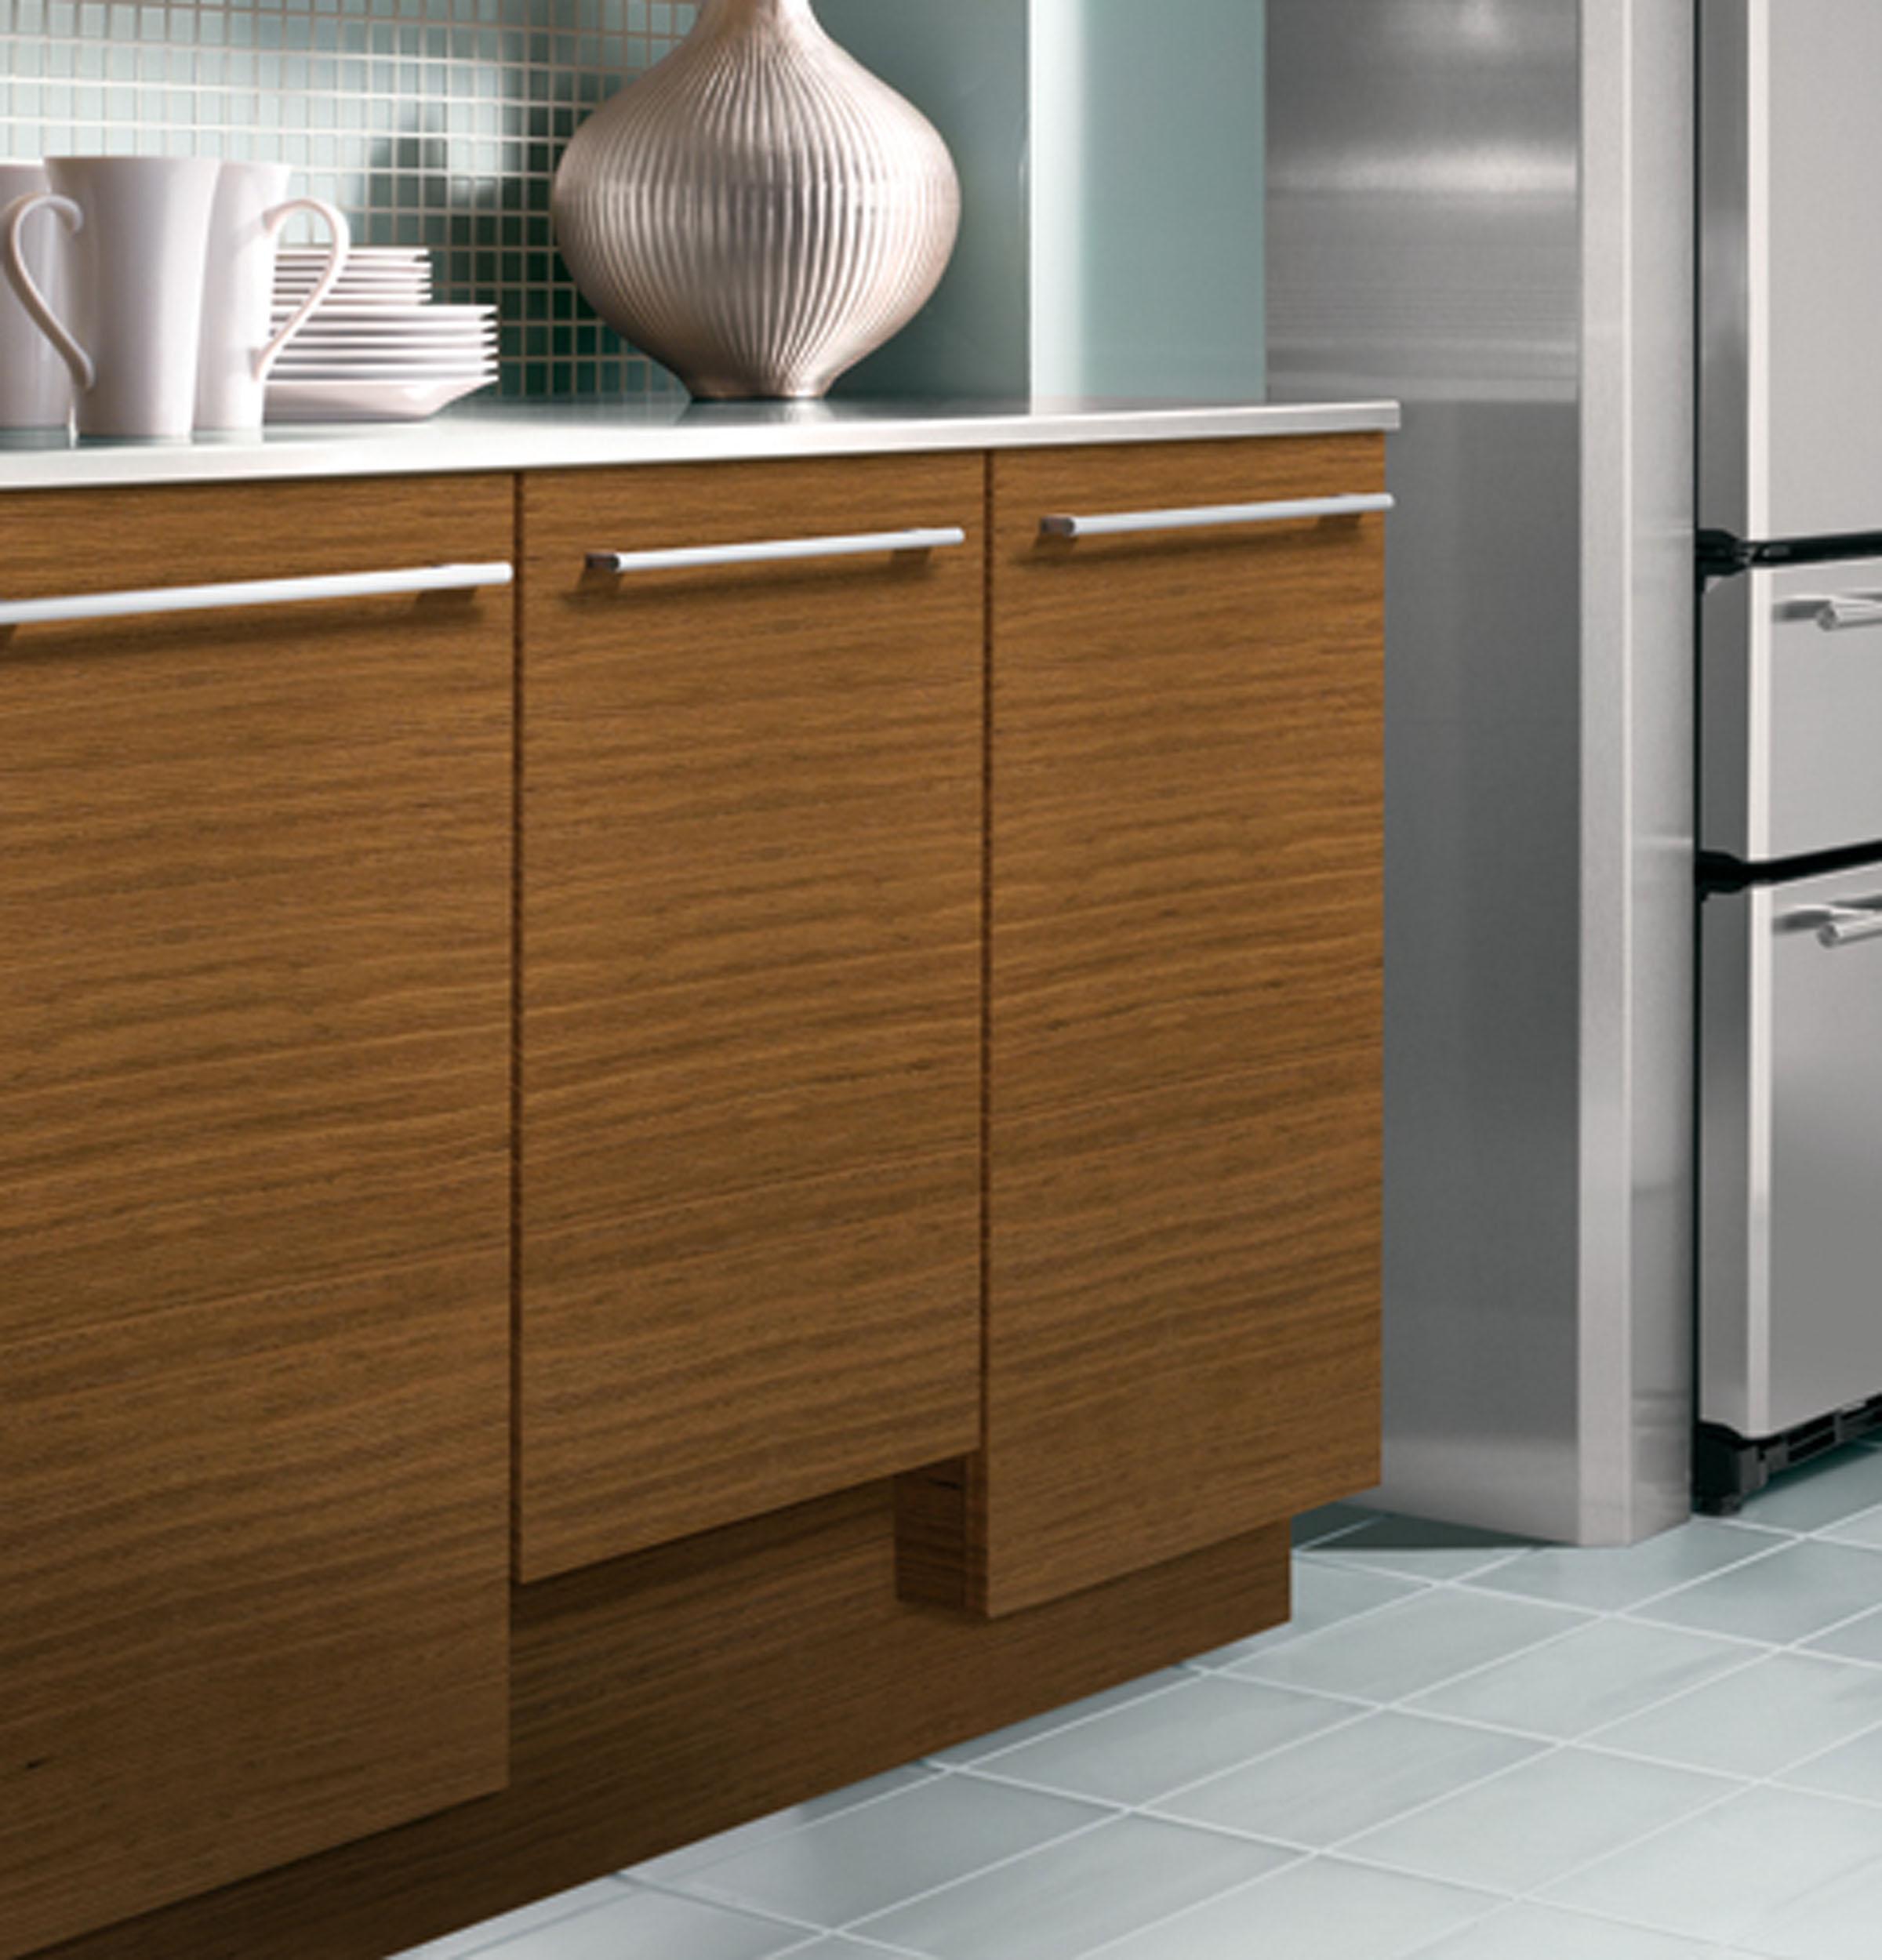 "Model: ZDT165SILII   Monogram Monogram 18"" Dishwasher"